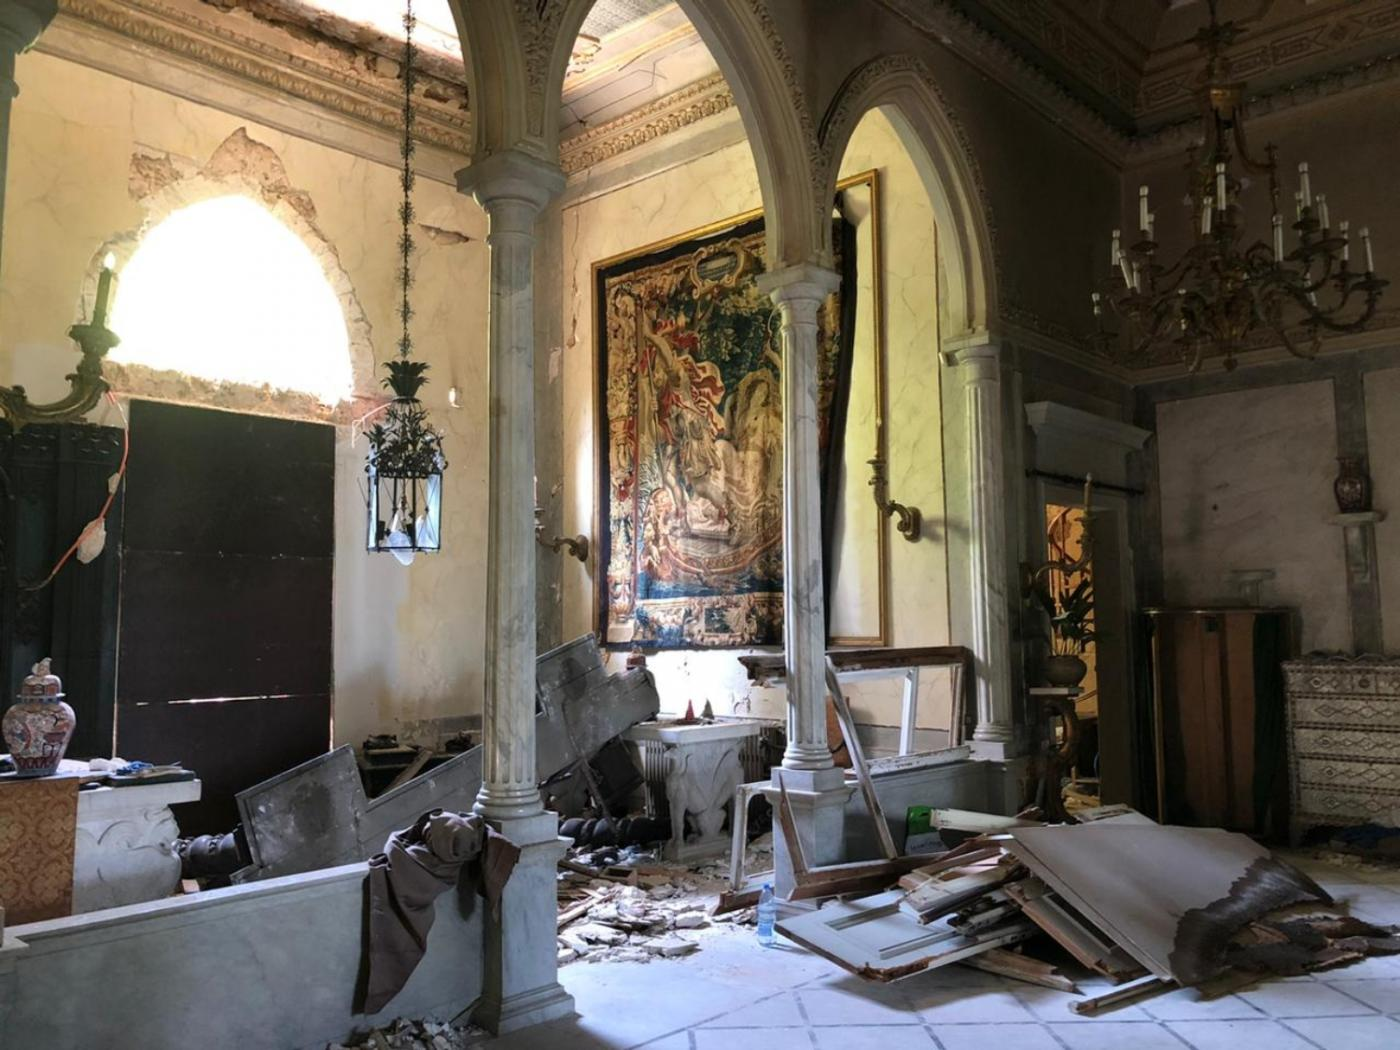 Sursock Museum heavily damaged during the Beritu blast on August 4, 2020